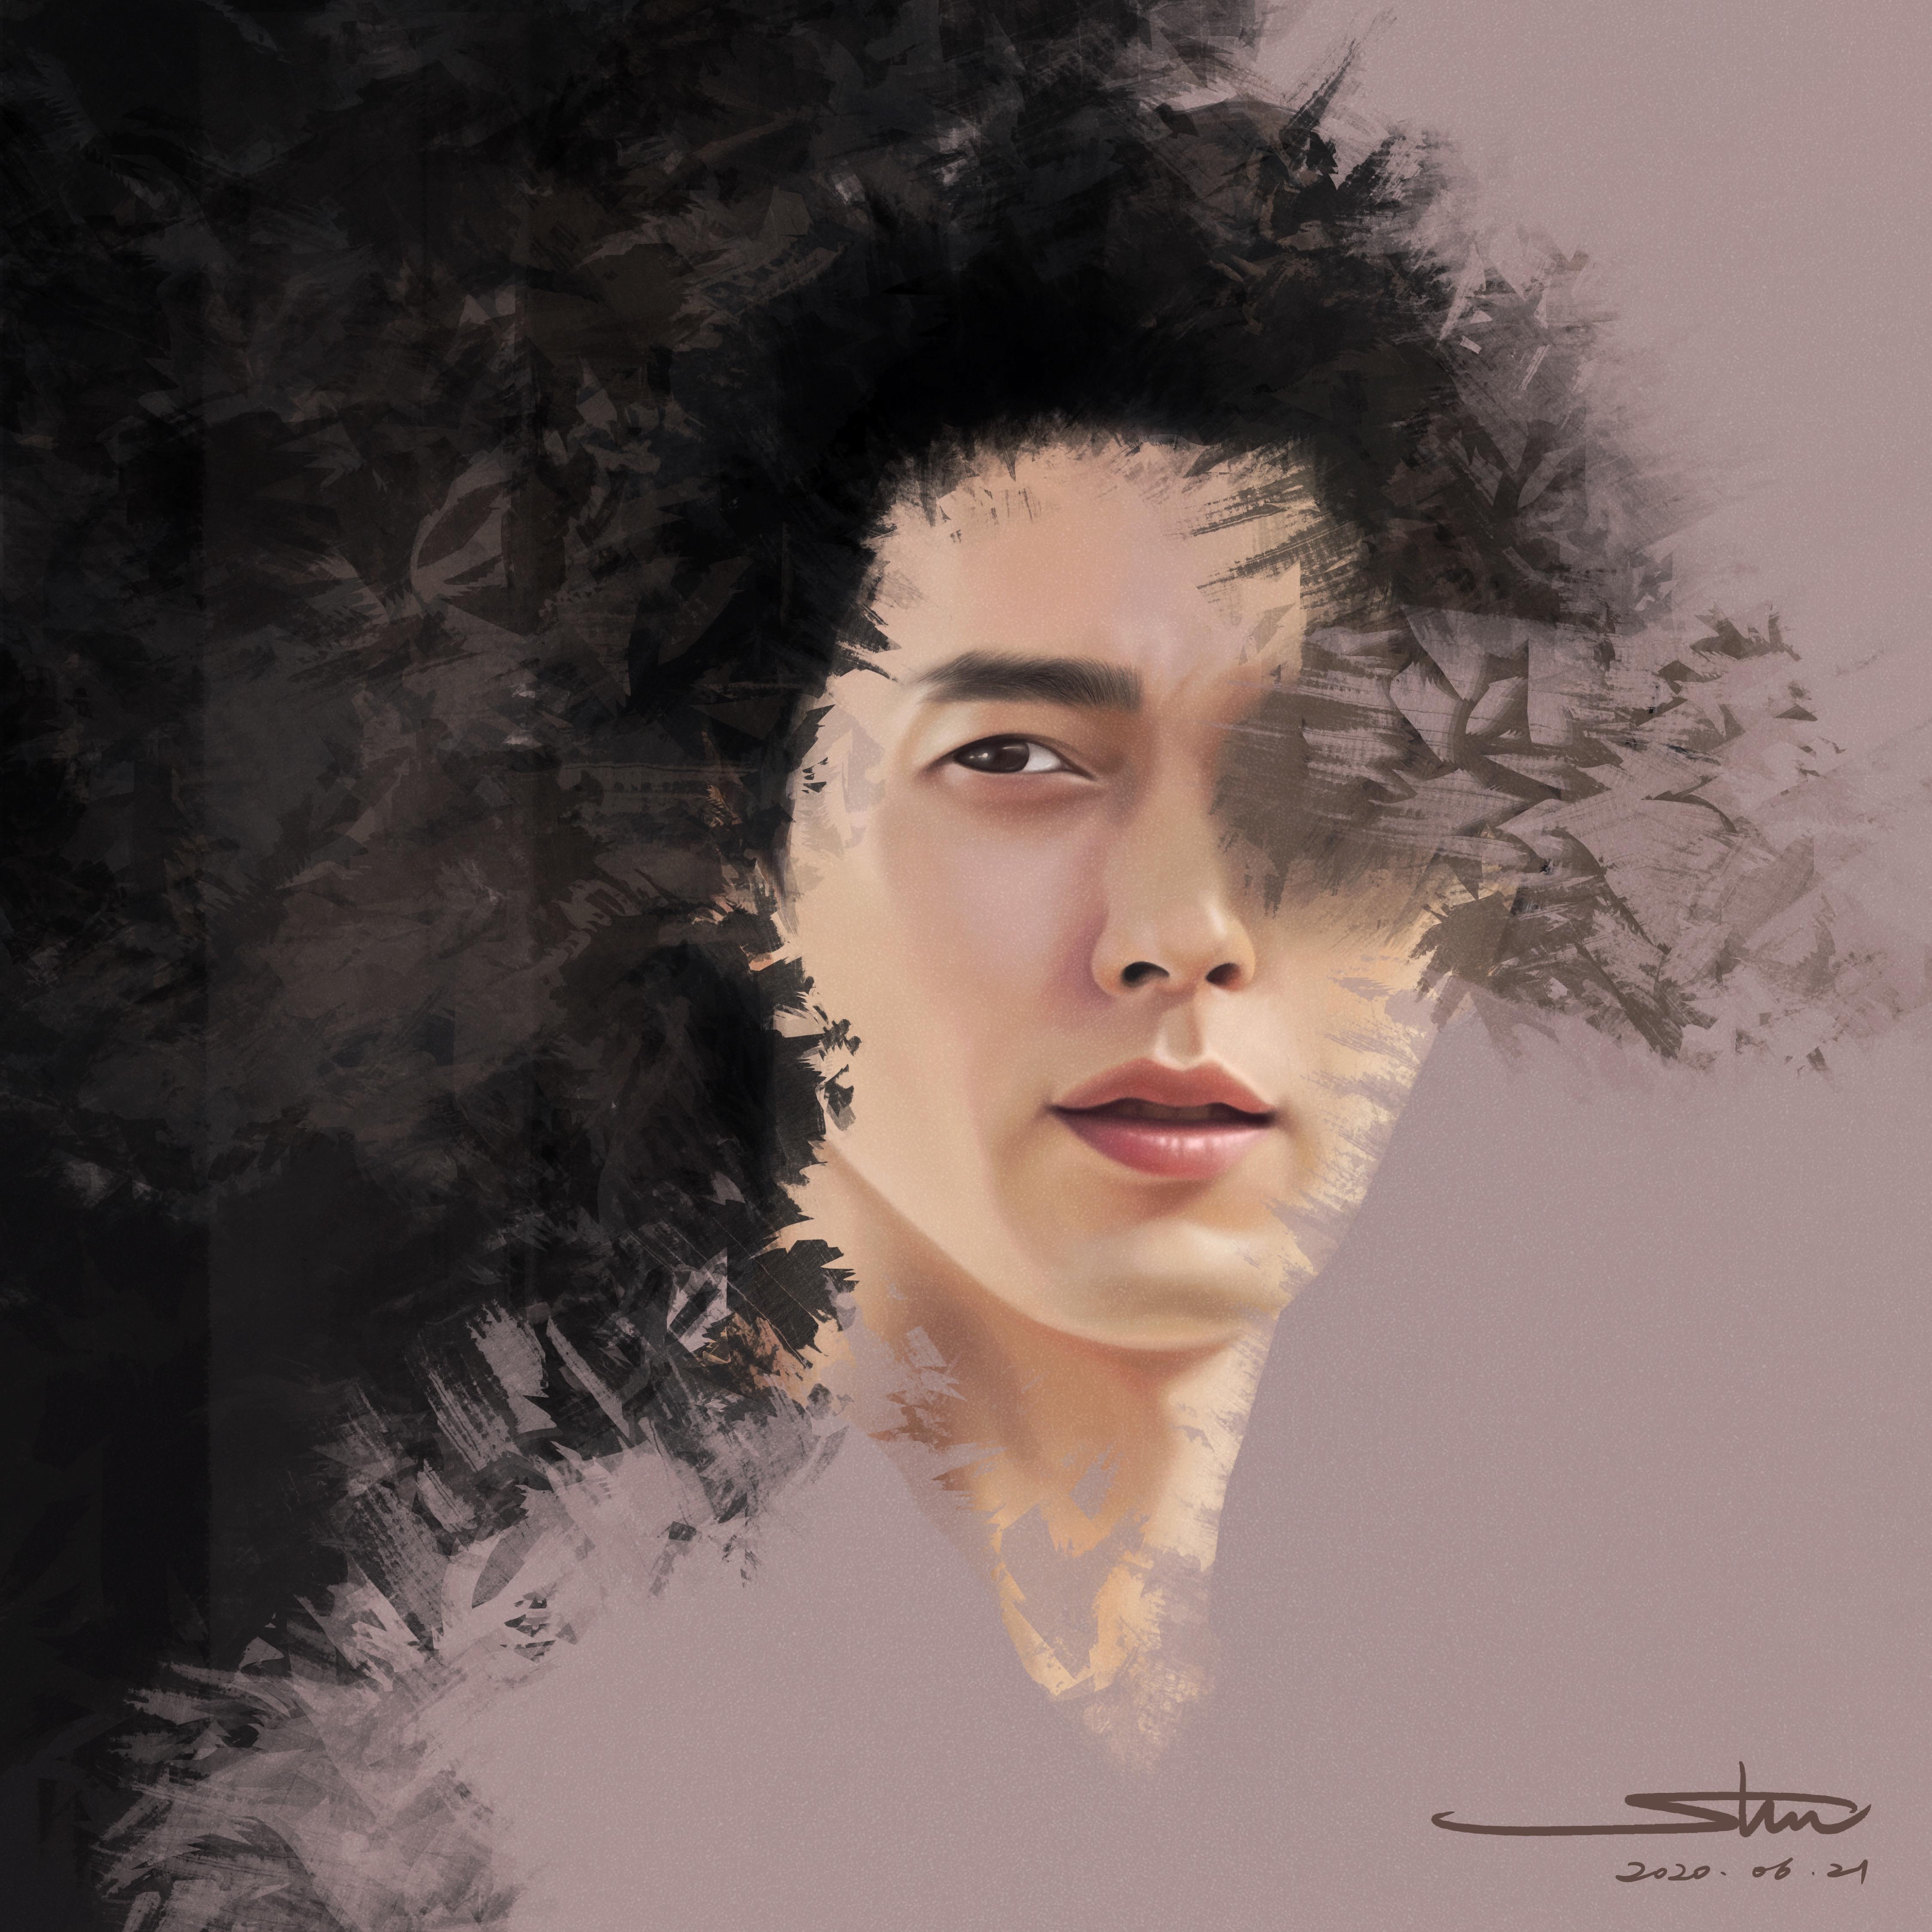 Digital Drawing of Hyun Bin